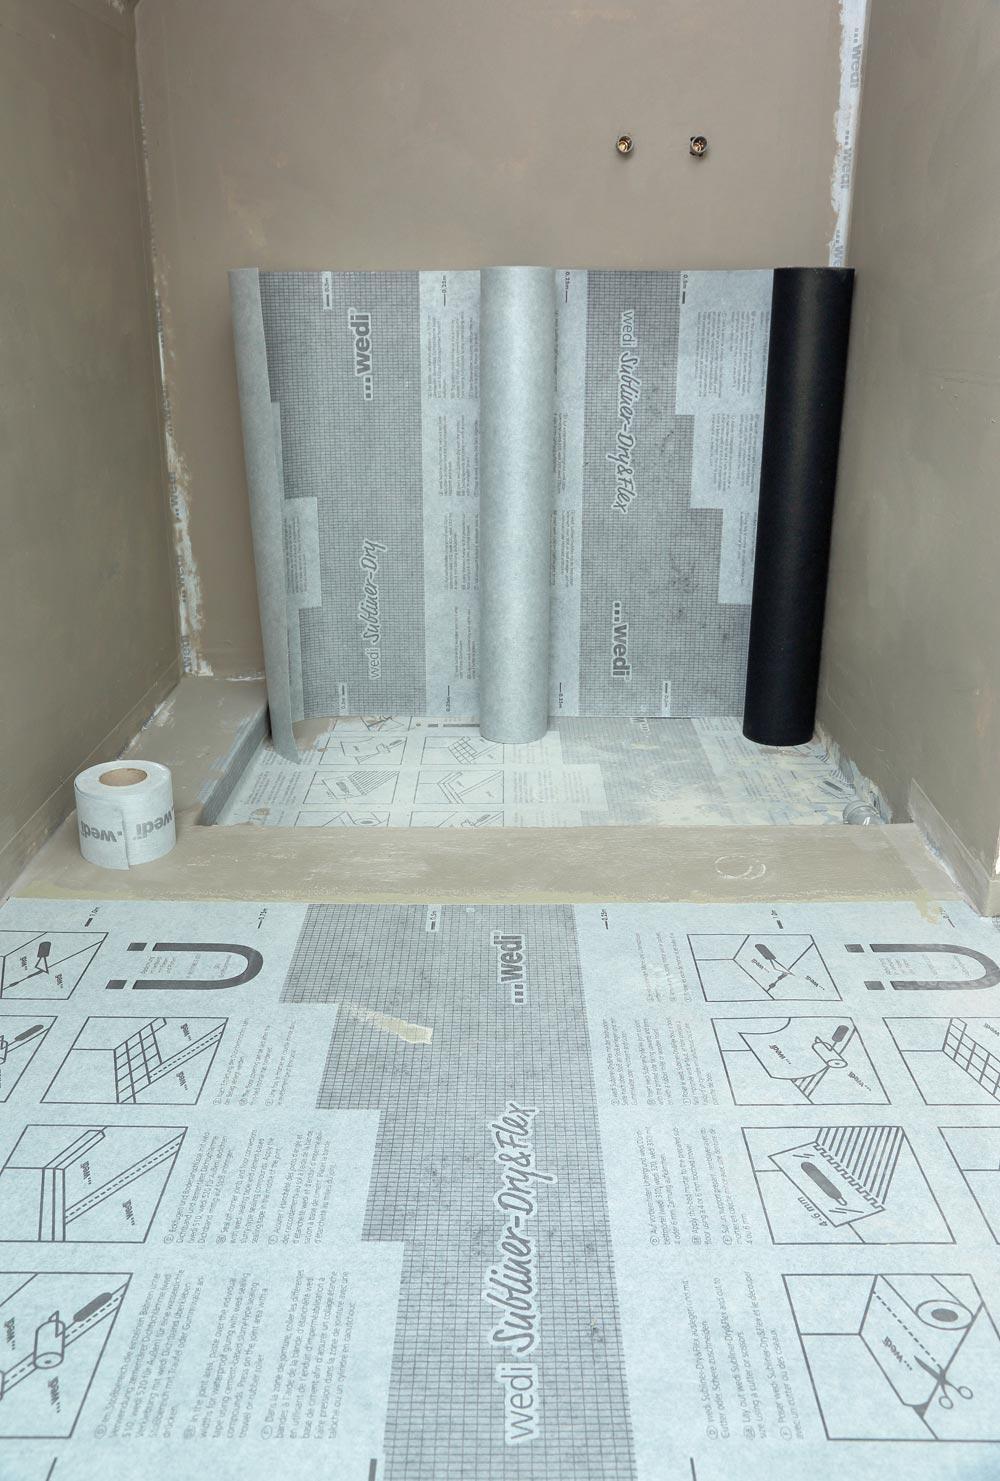 wedi subliner dry flex abdichtungs und. Black Bedroom Furniture Sets. Home Design Ideas